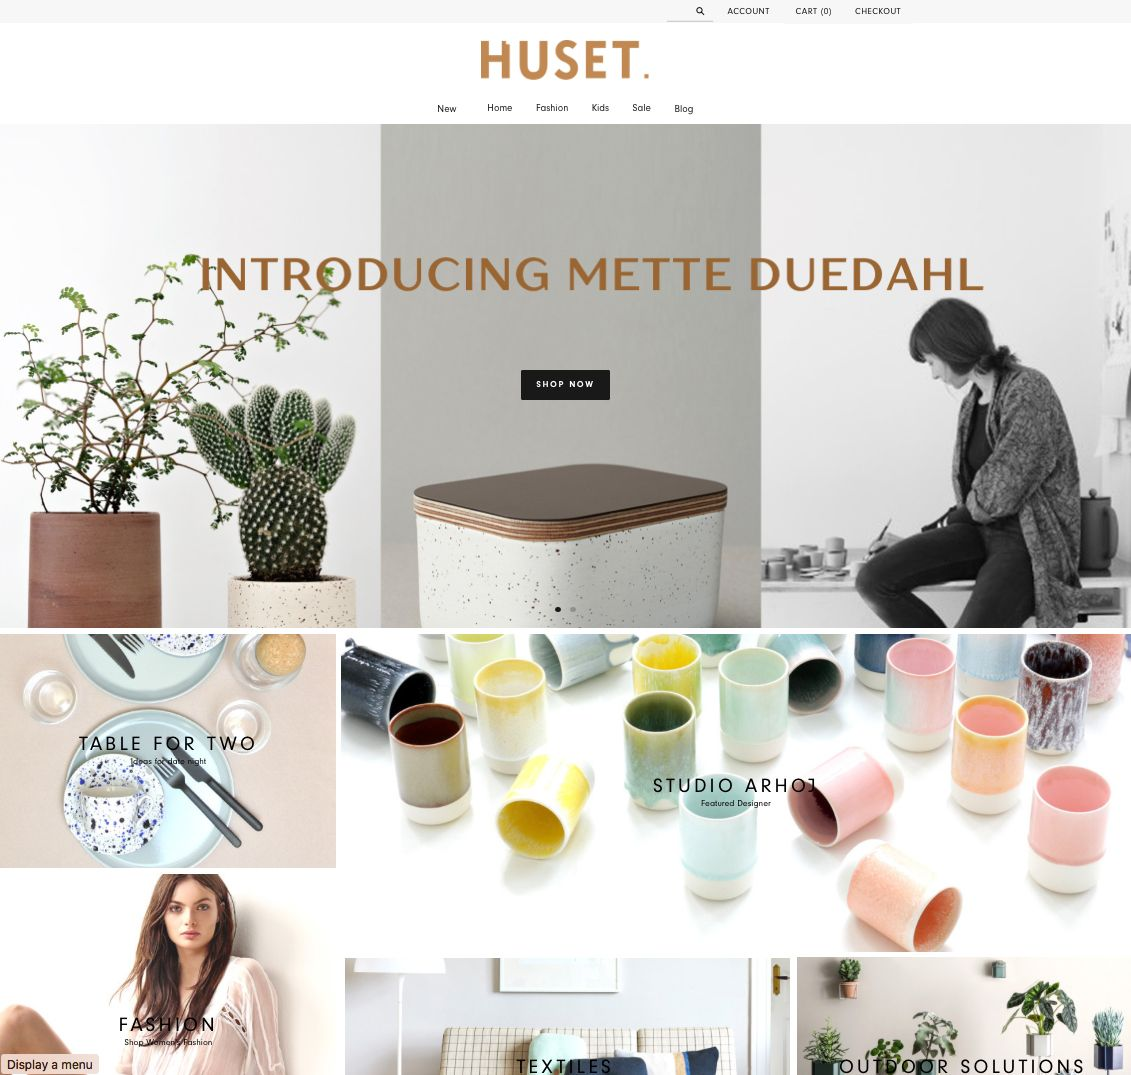 Huset #shopdirectory #bestonlineshops